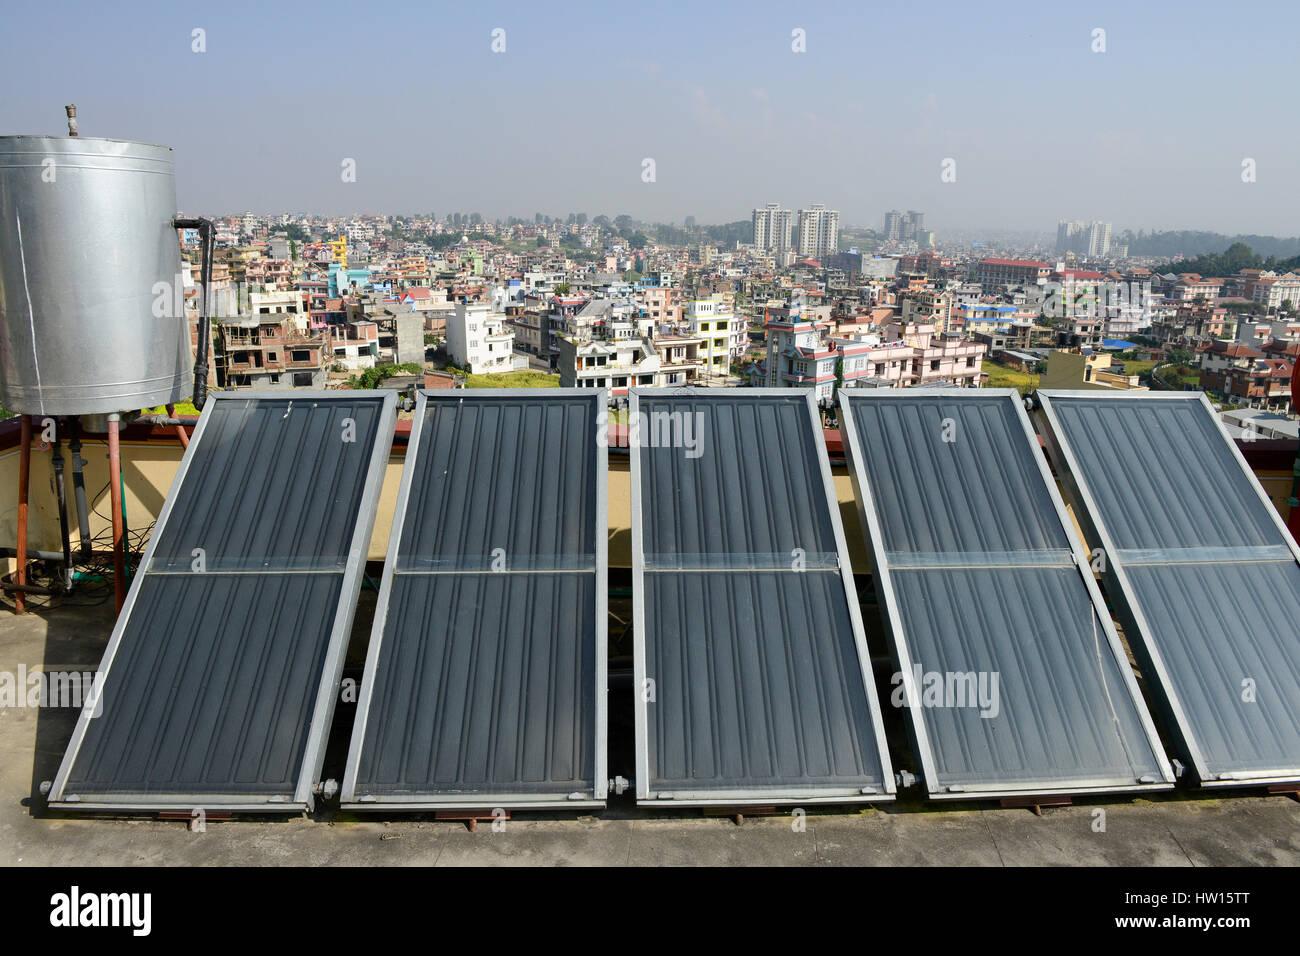 NEPAL Kathmandu, appartment building with solar collector for water heating / Haus mit Sonnenkollektor fuer Warmwasseraufbereitung - Stock Image